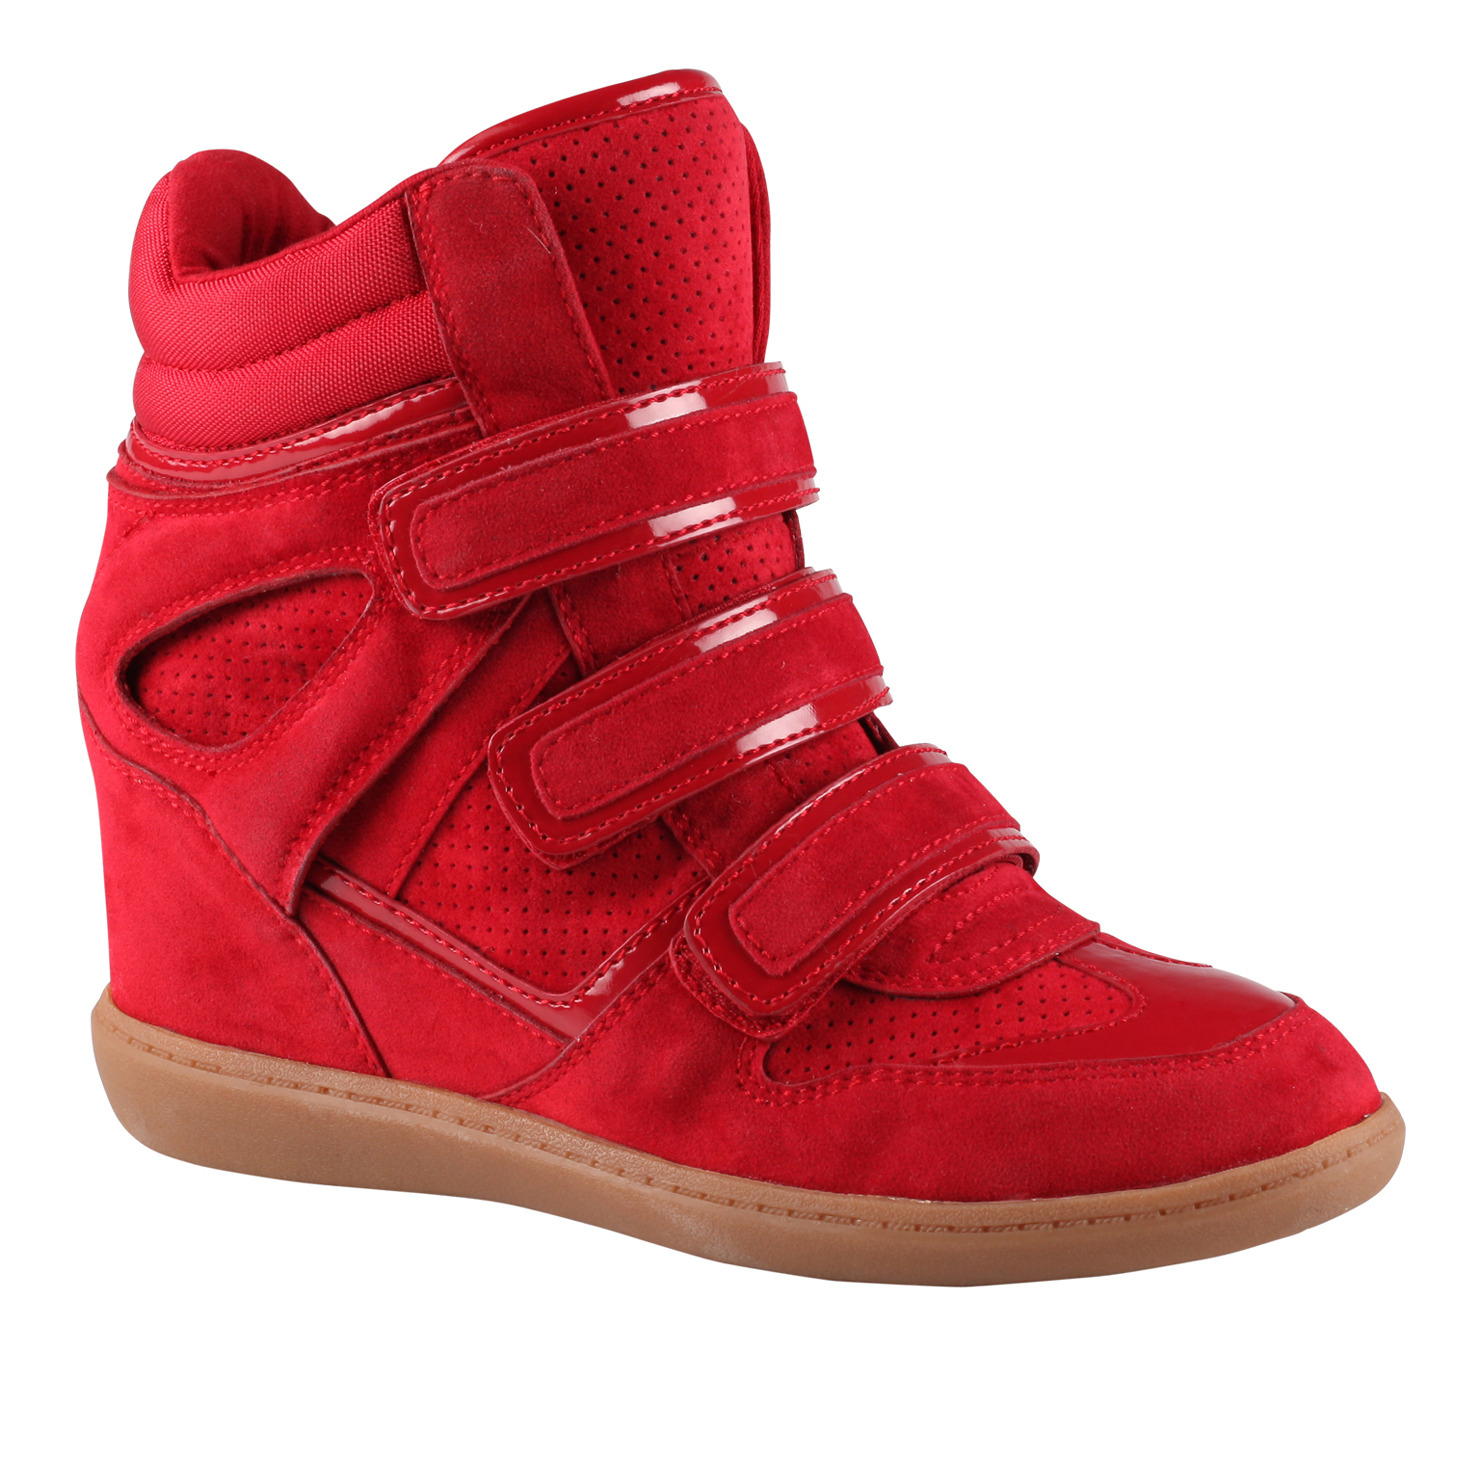 Aldo Numata Trainer Shoes in Red